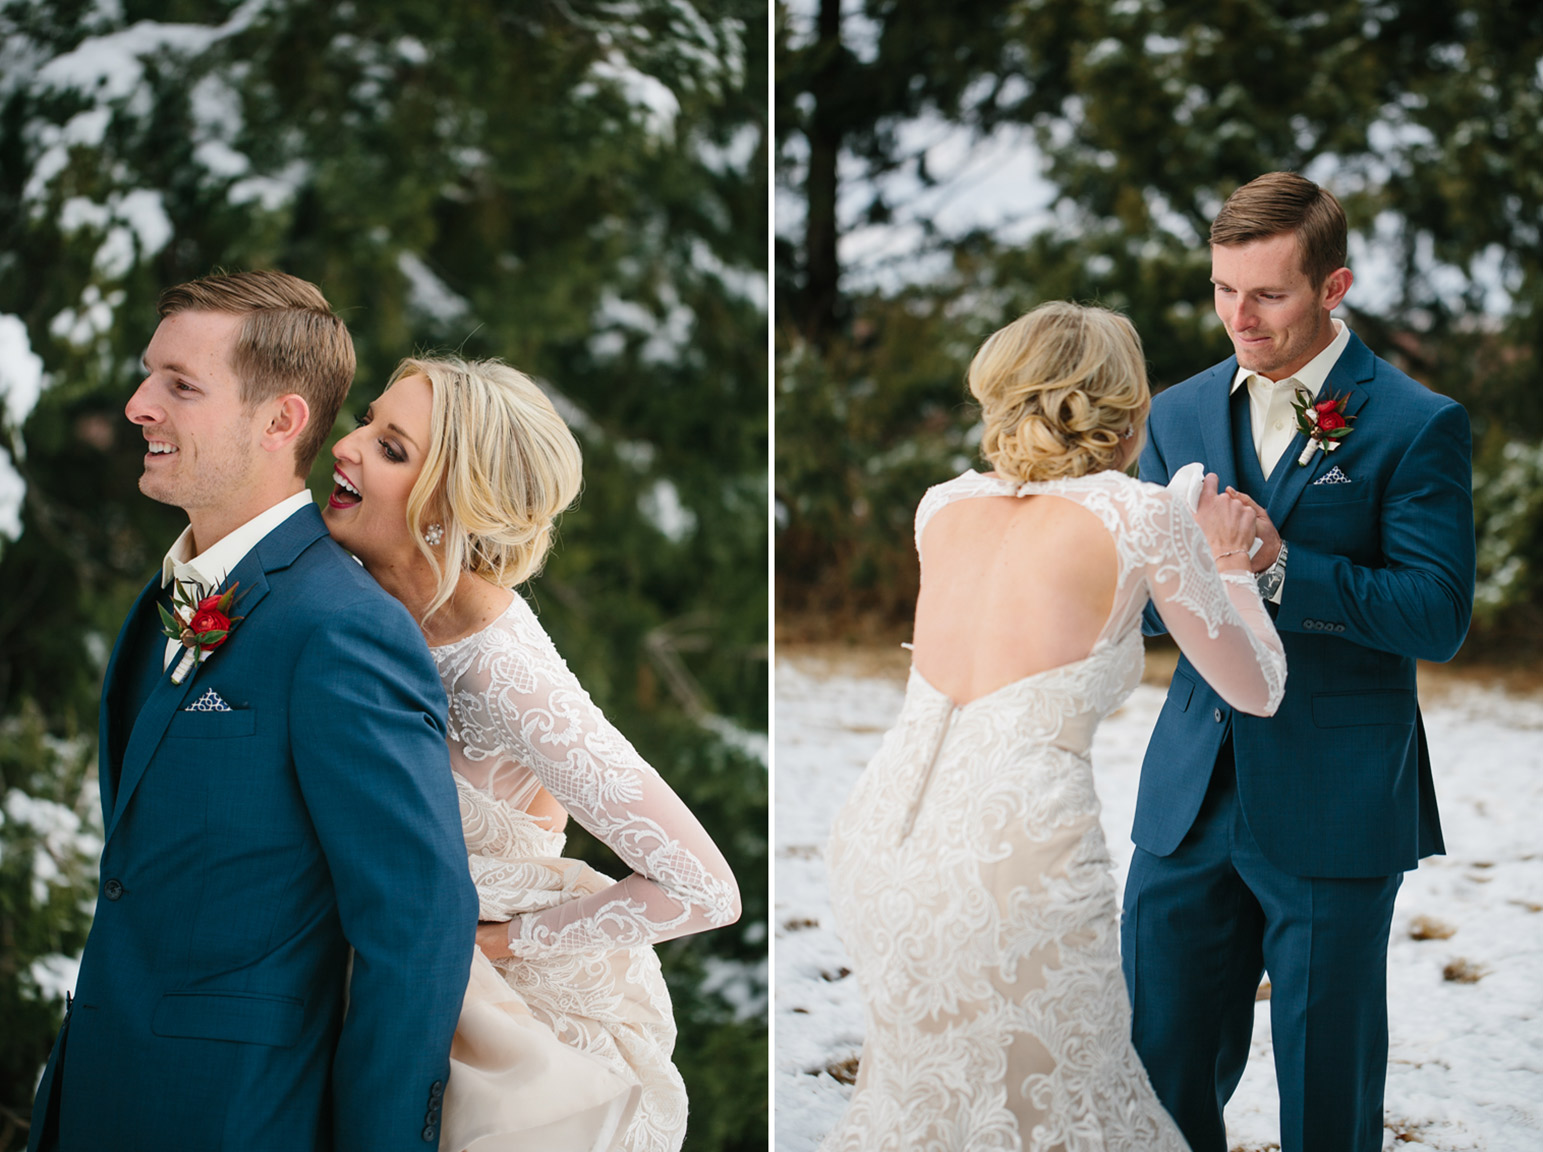 Cotton_Creek_Barn_Winter_Wedding_WeddingPhotographer017.jpg